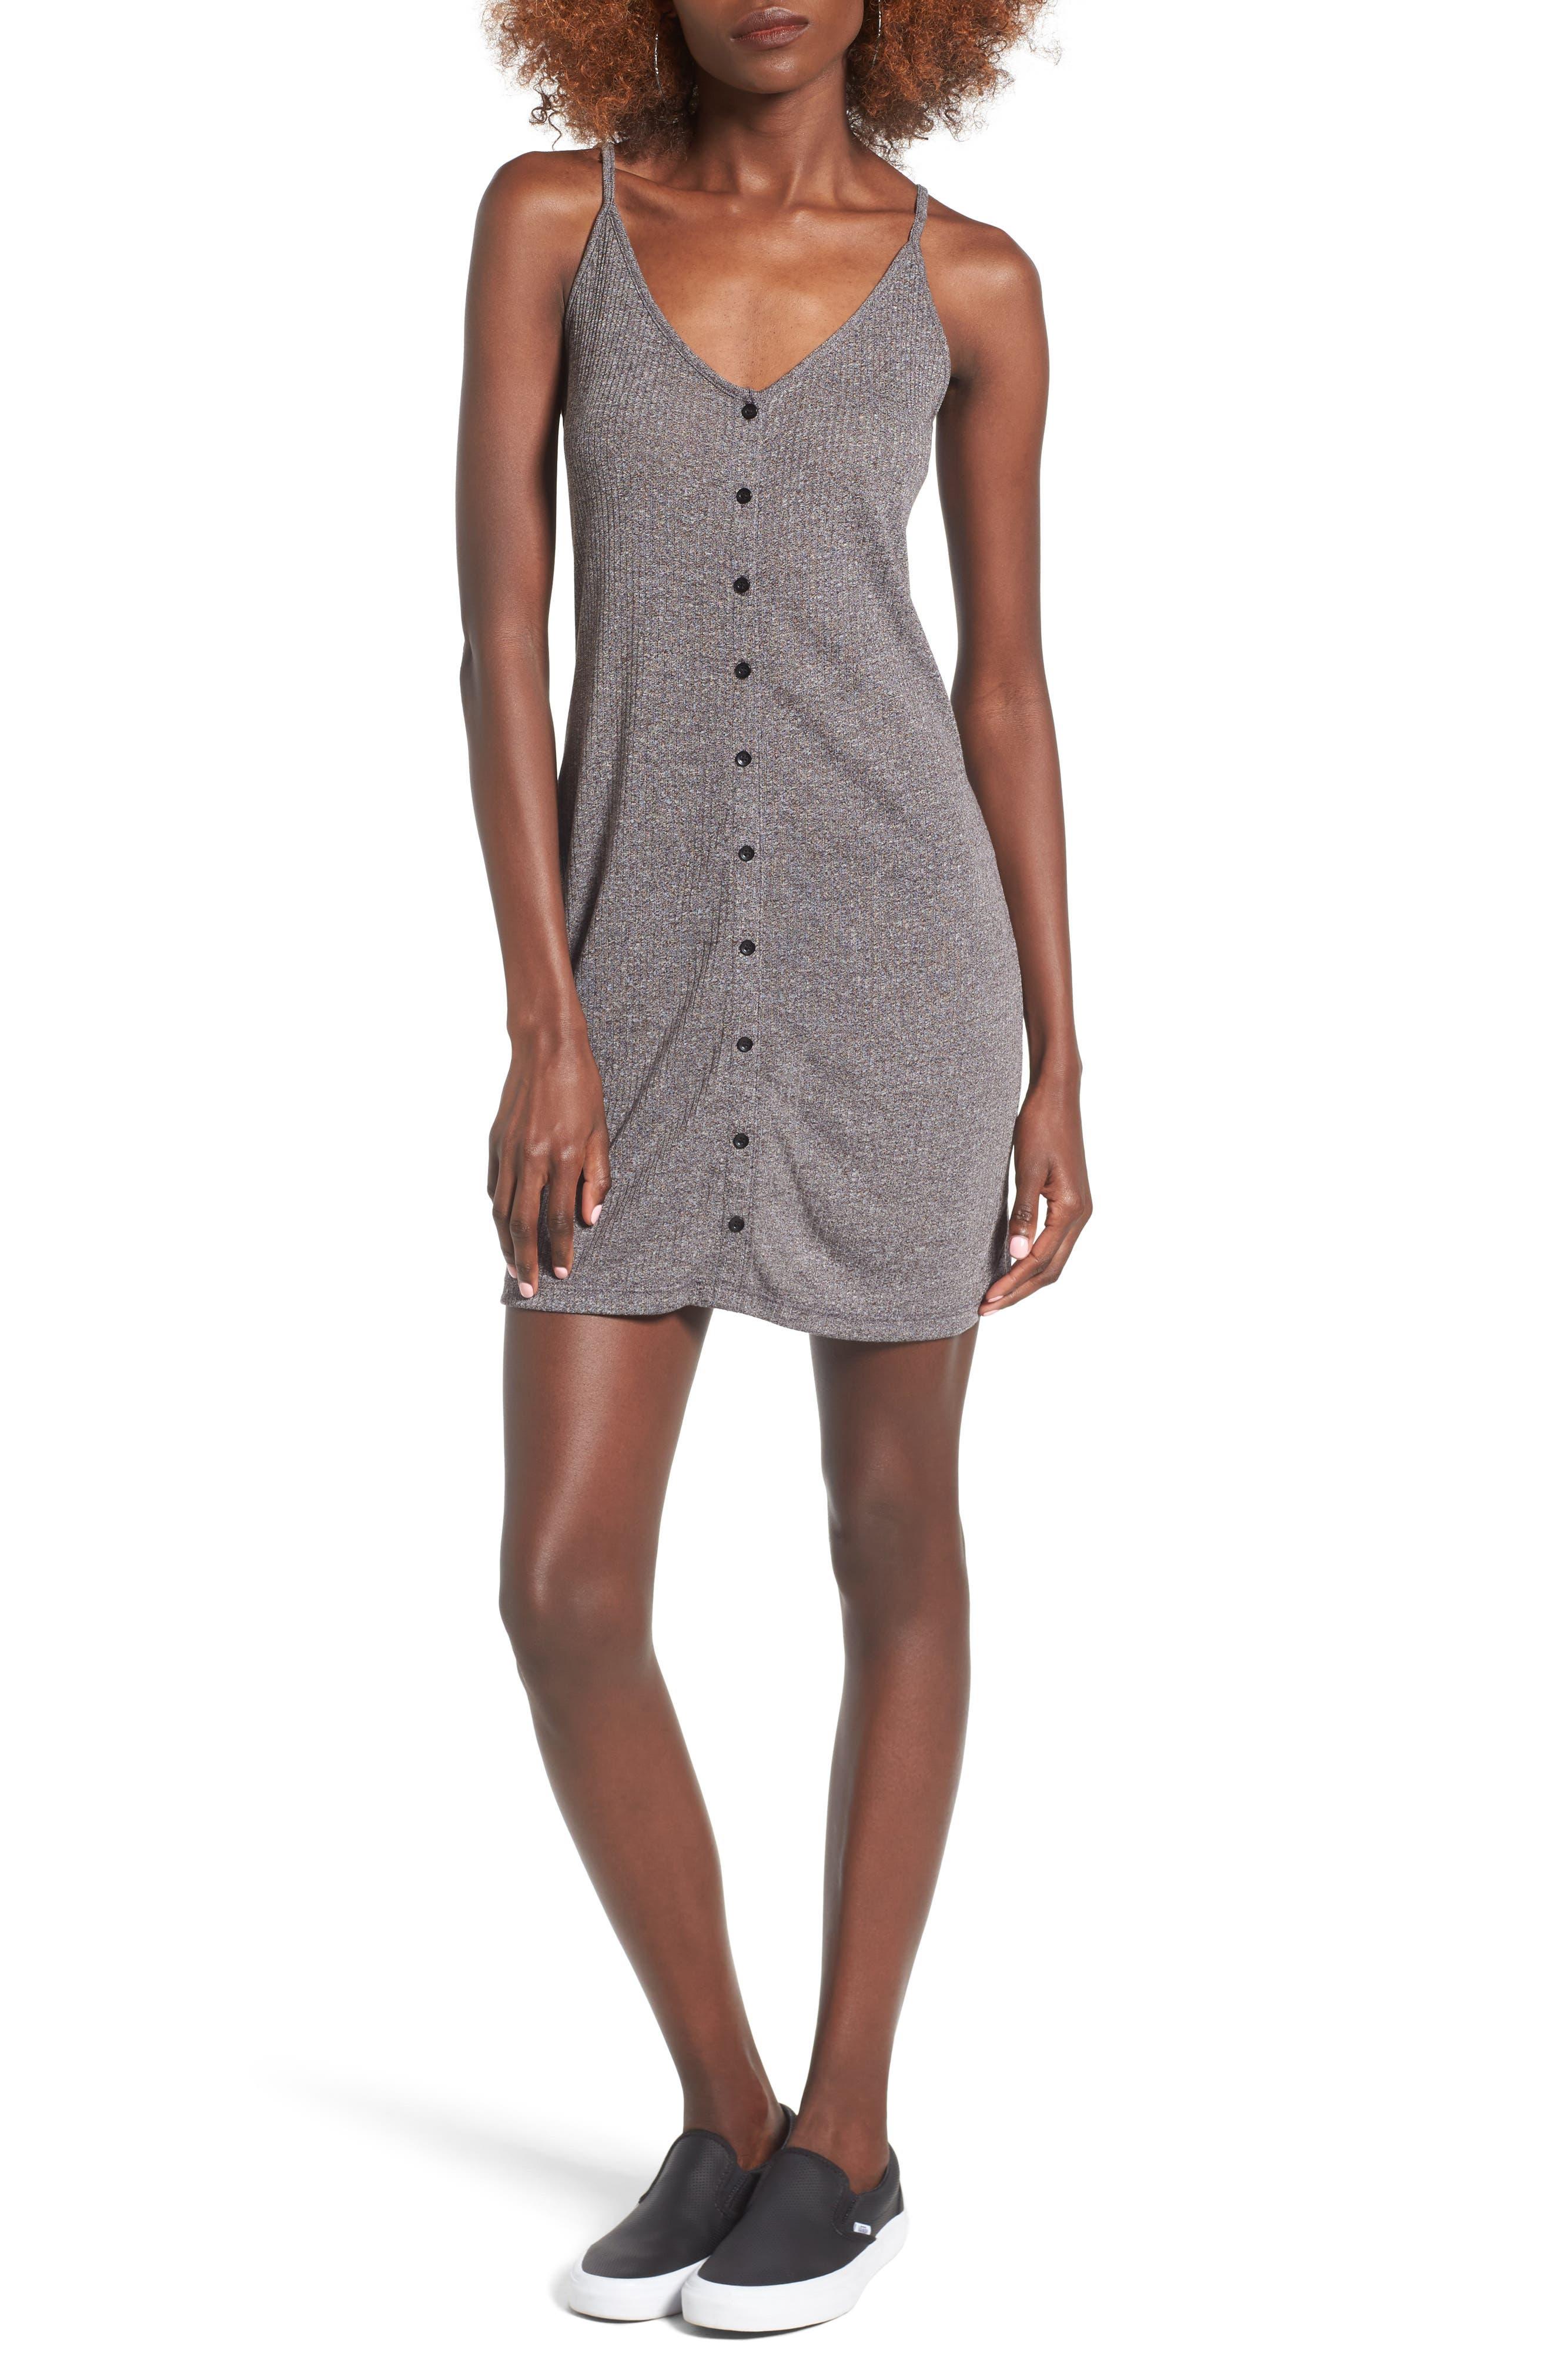 Barbados Rib Knit Dress,                         Main,                         color, Heather Grey